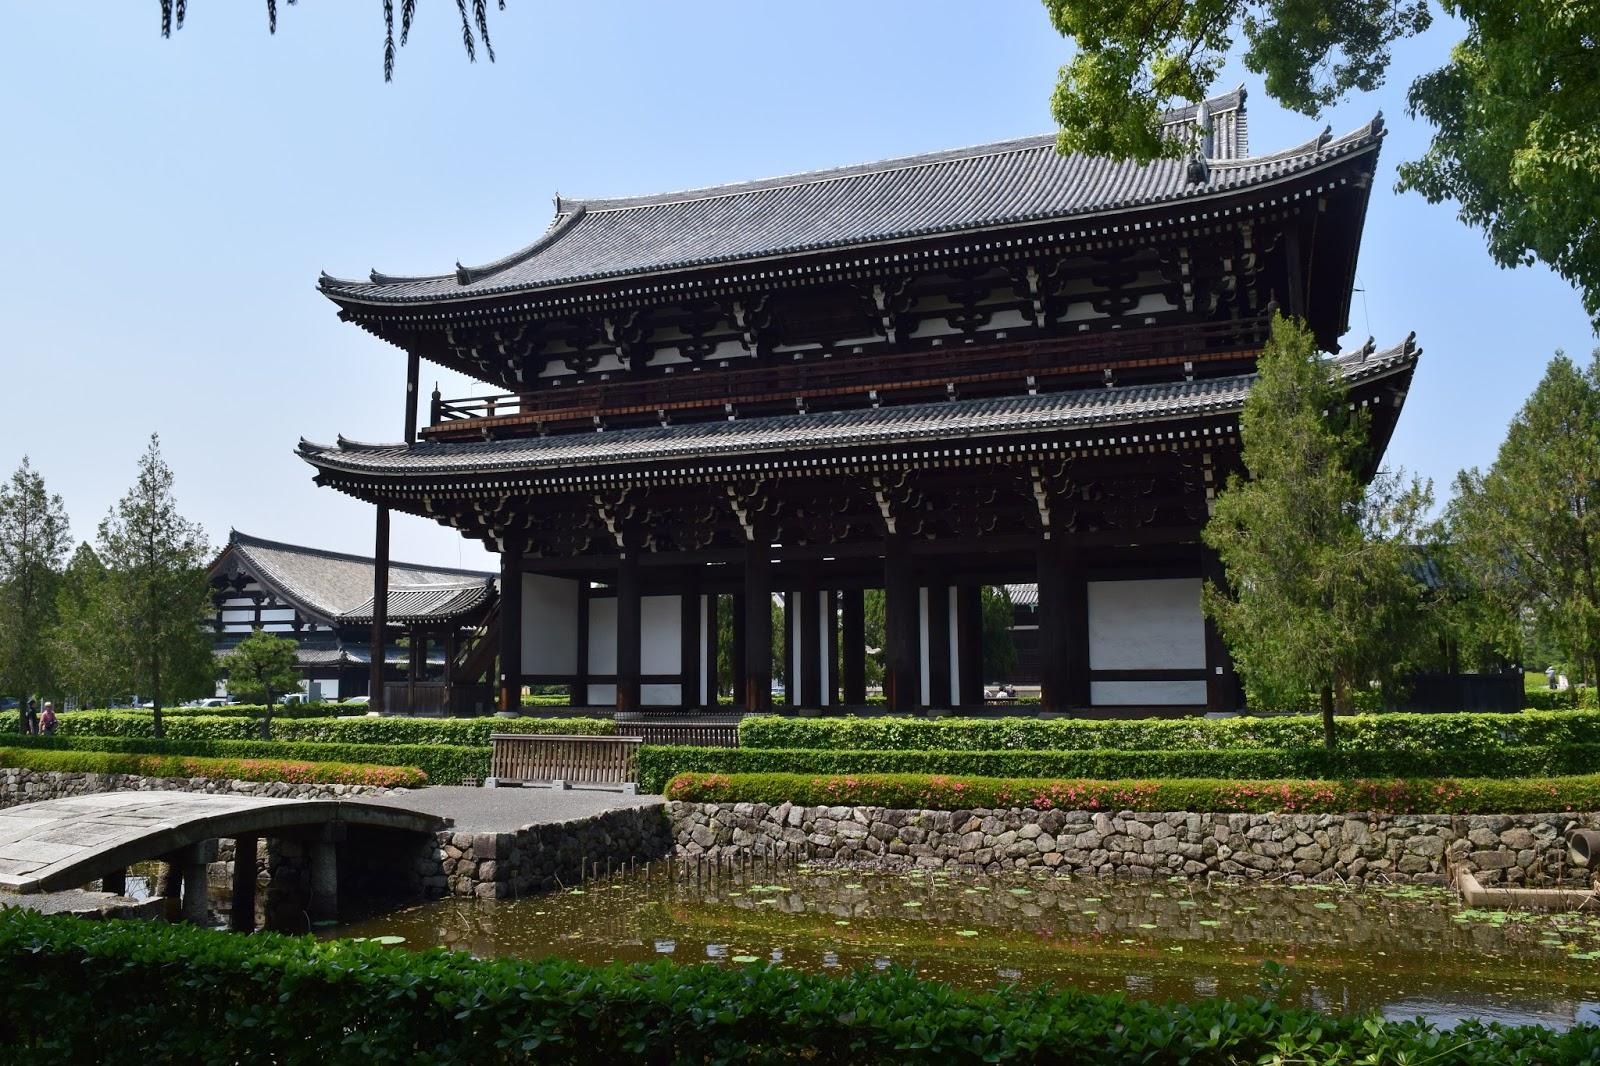 Tofukuji Sanmon Gate